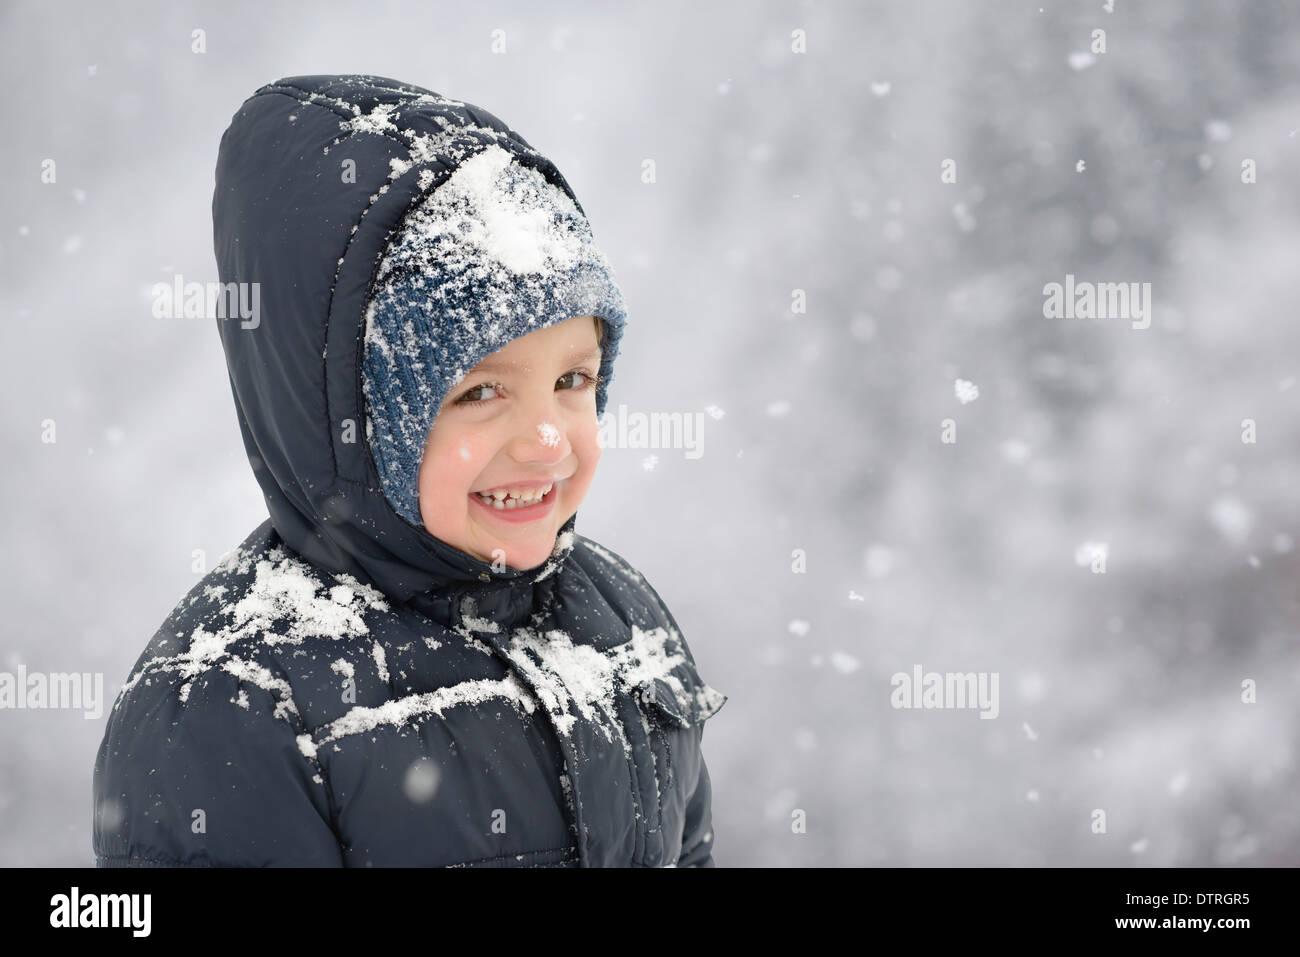 Happy Child in Wintertime snowflakes around - Stock Image